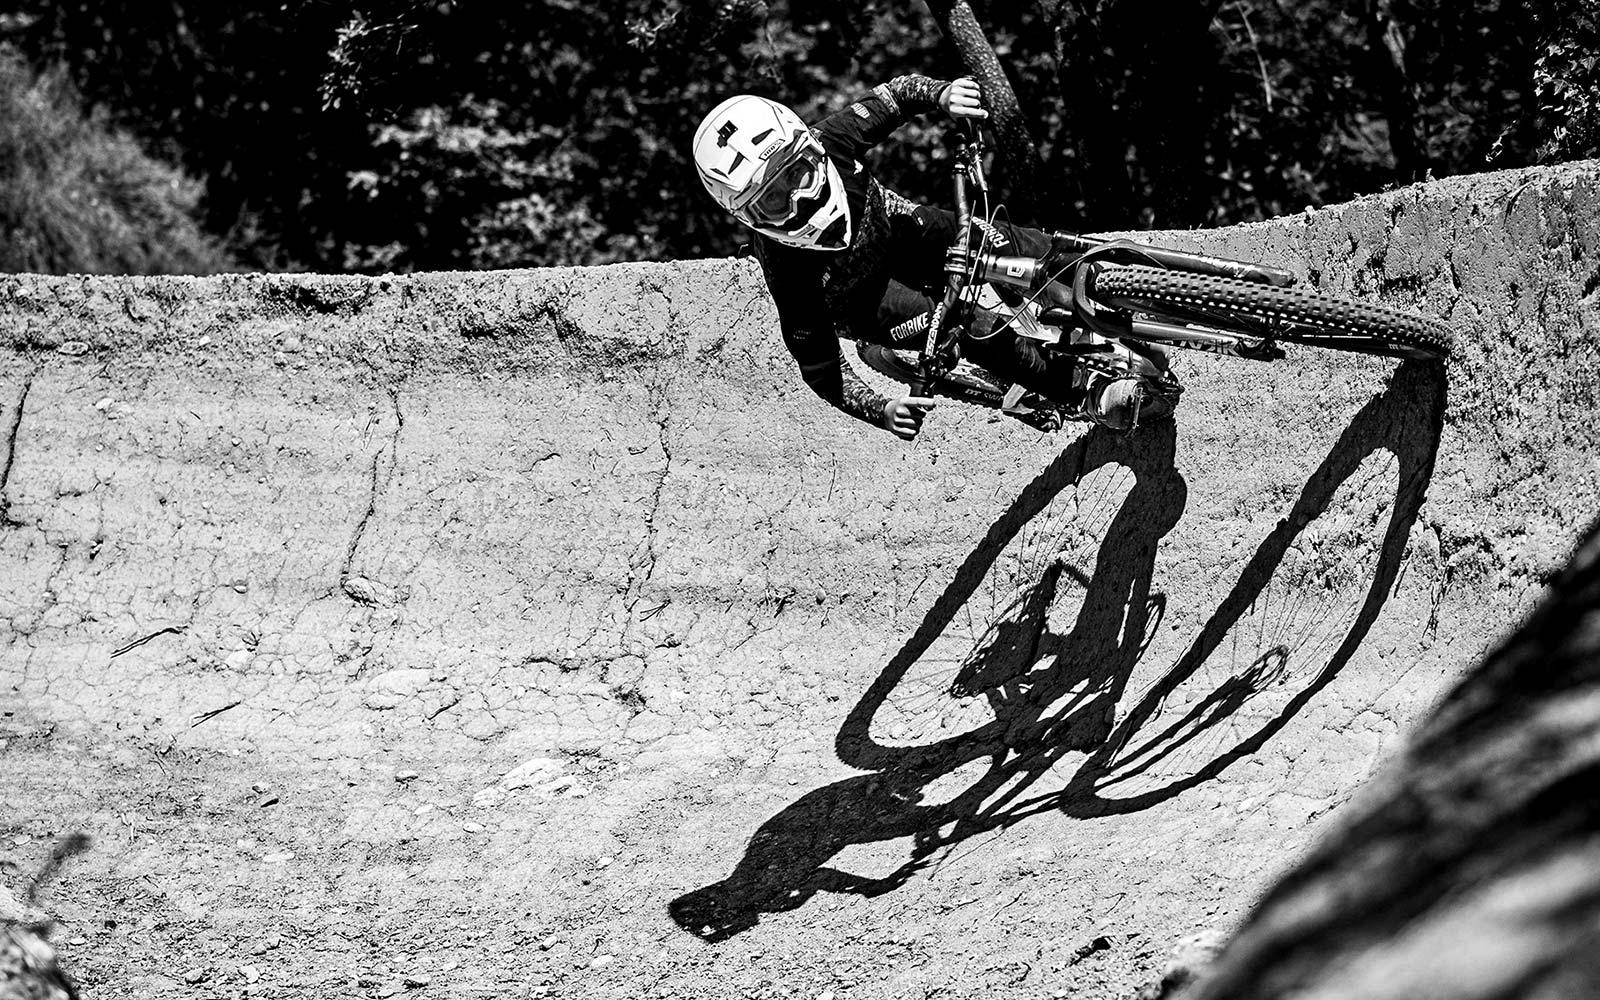 2022 Commencal Clash Kids alloy enduro bikes for small MTB riders,berm